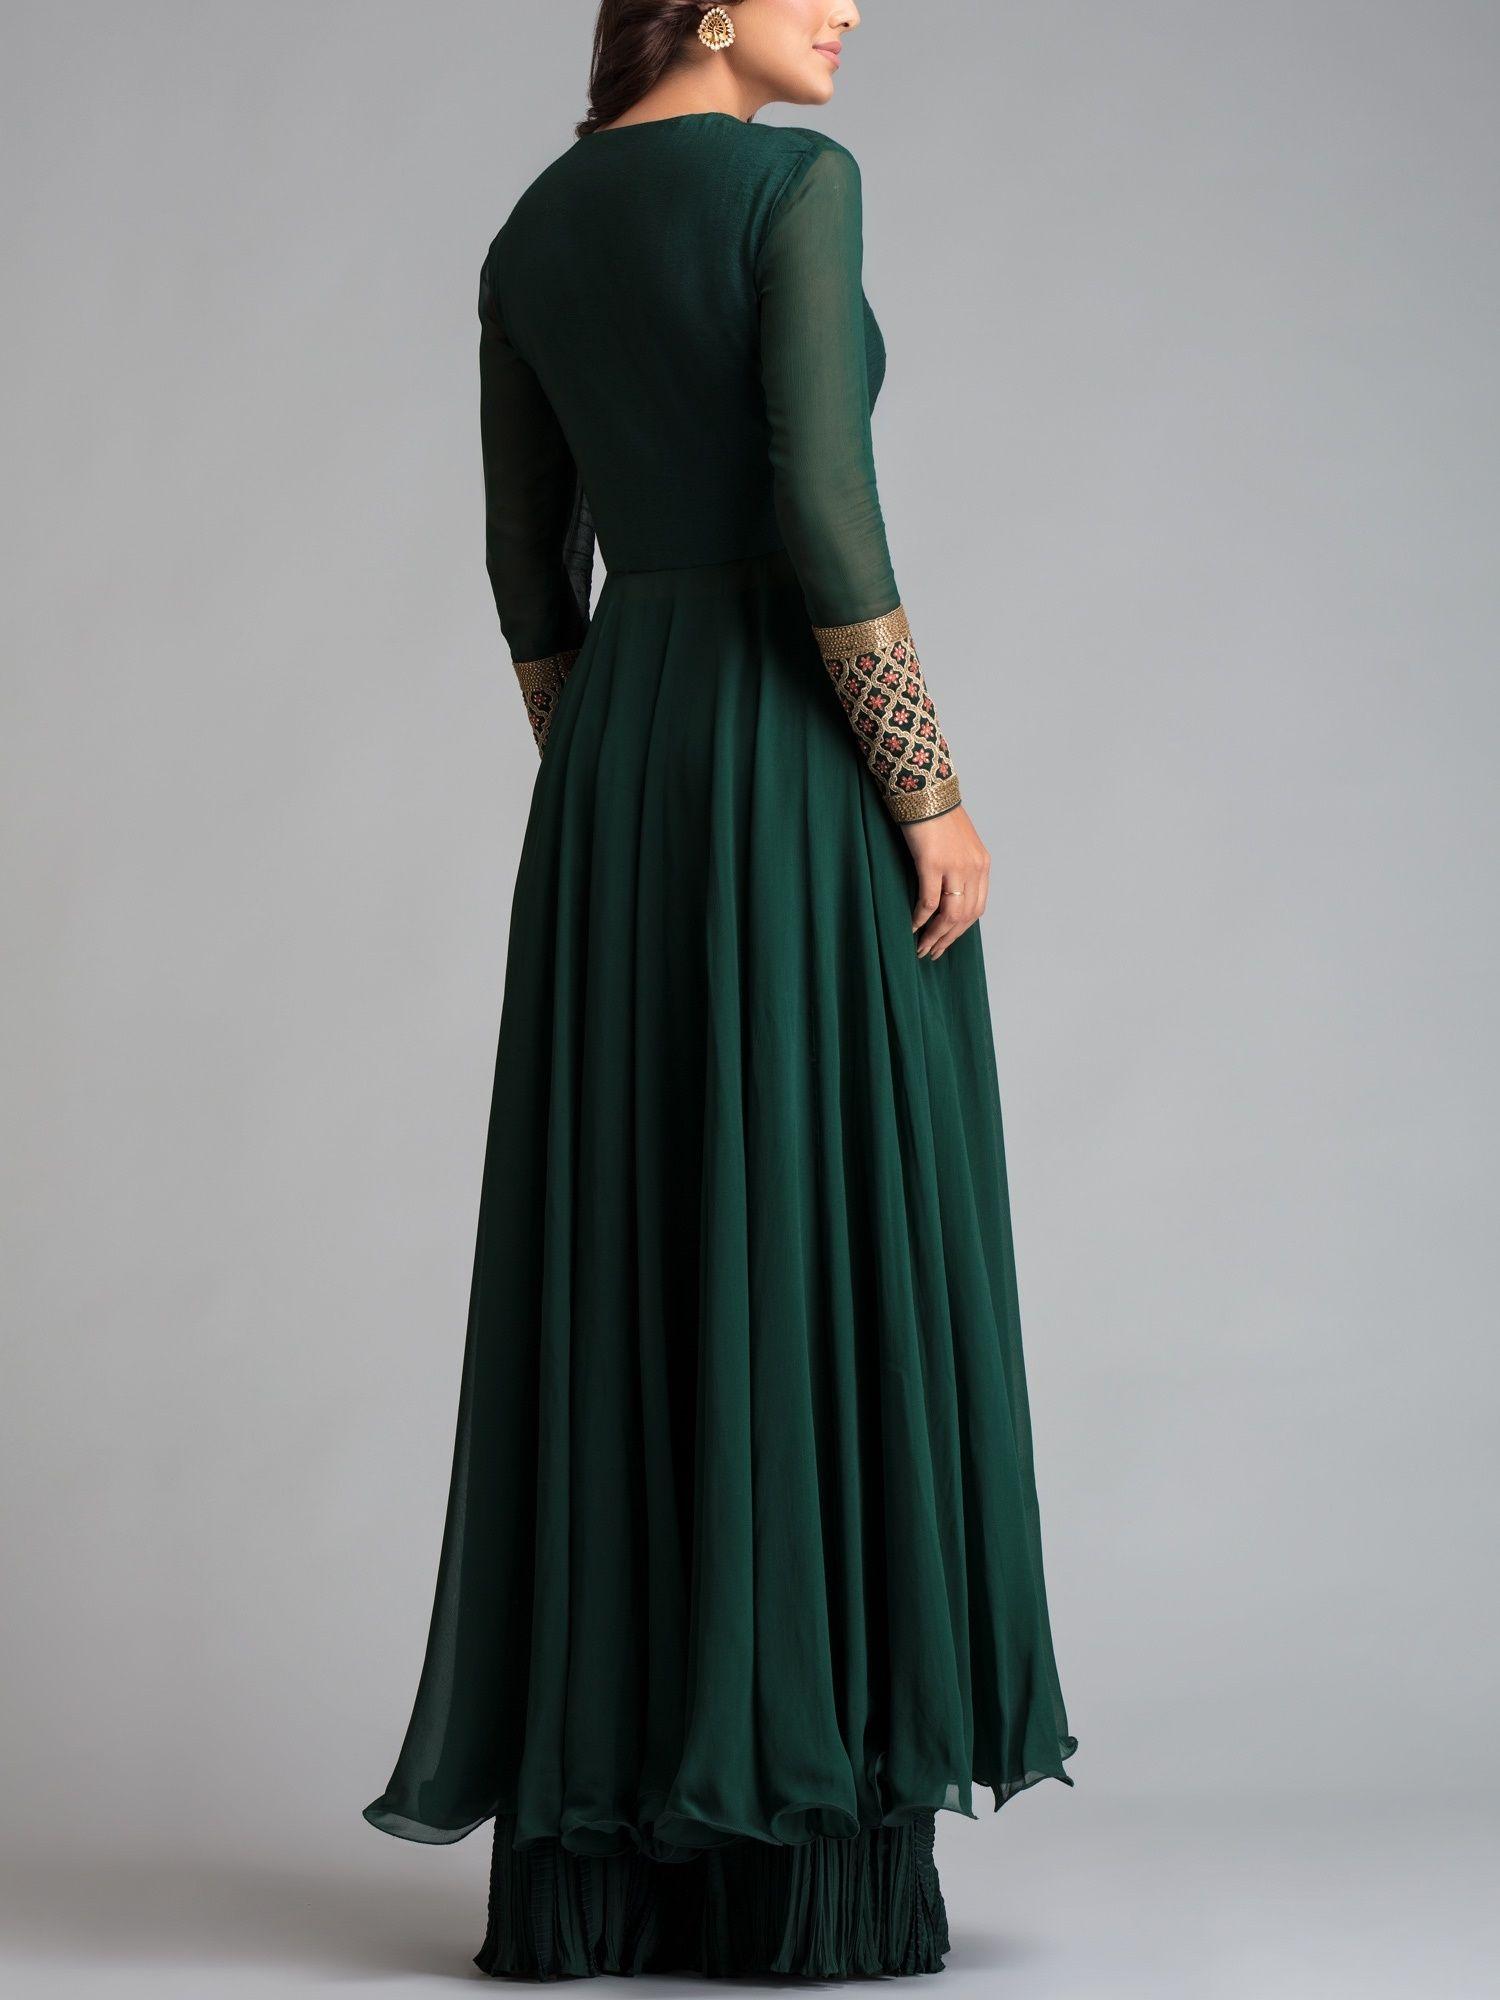 a54eb96c31e Avdi Kurtis Kurtas and Tunics : Buy Avdi Emerald Green Embroidered ...